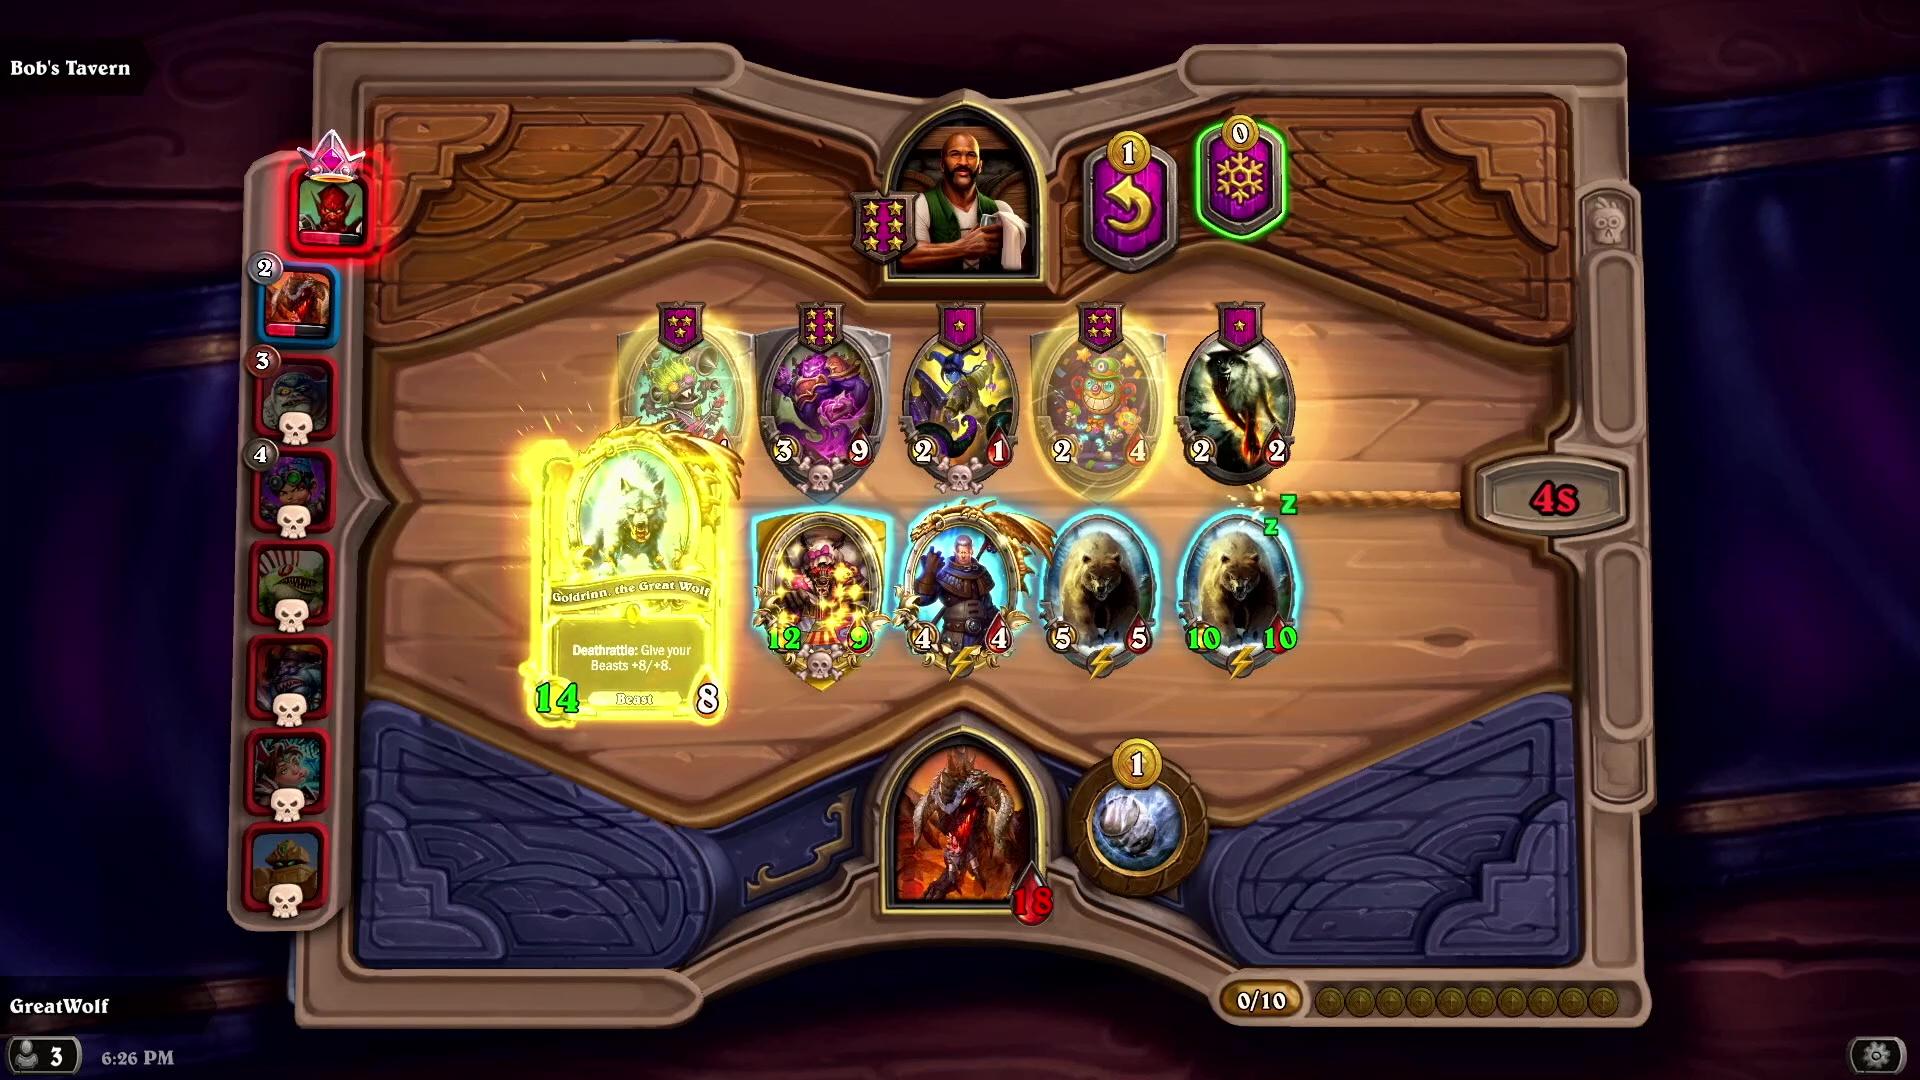 Blizzard announces Hearthstone Battlegrounds, a new autobattler set in the Warcraft Universe